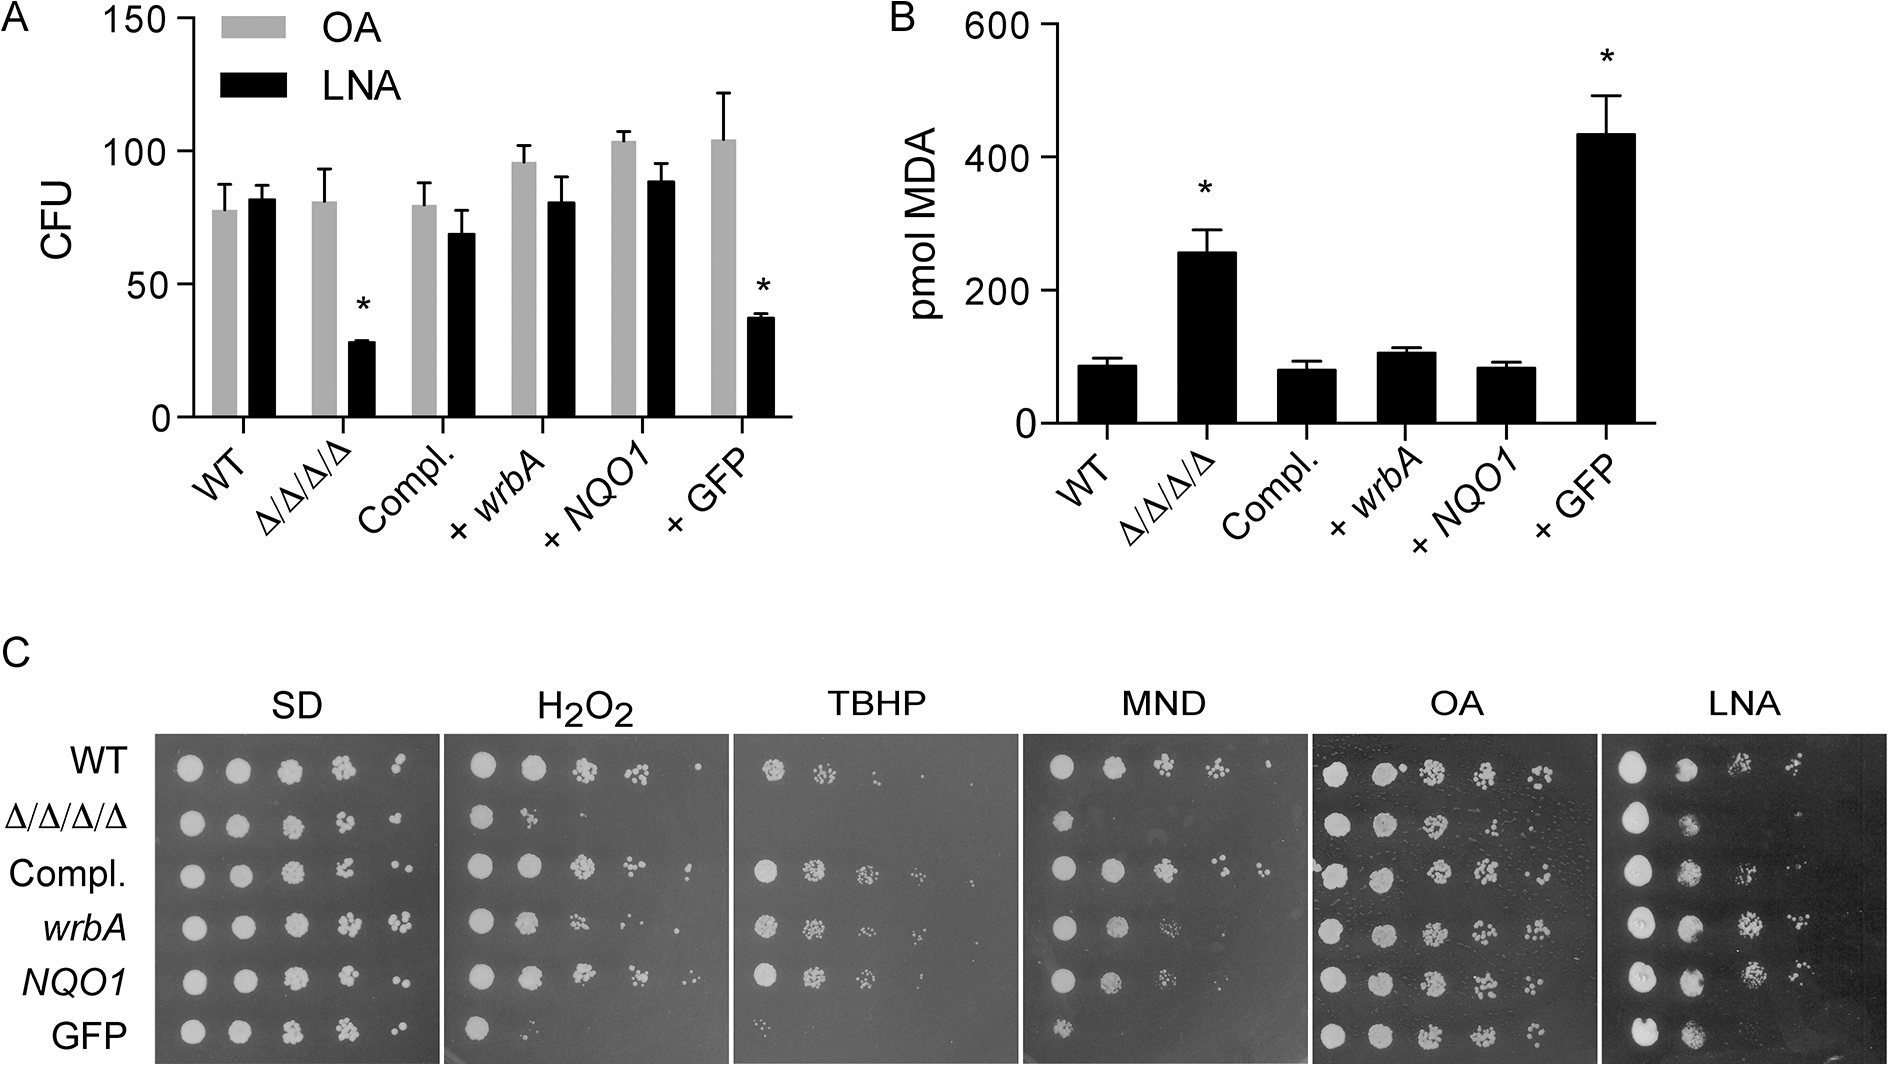 Heterologous expression of <i>E</i>. <i>coli wrbA</i> or rat <i>NQO1</i> rescues the sensitivity of Δ/Δ/Δ/Δ mutant to oxidants.